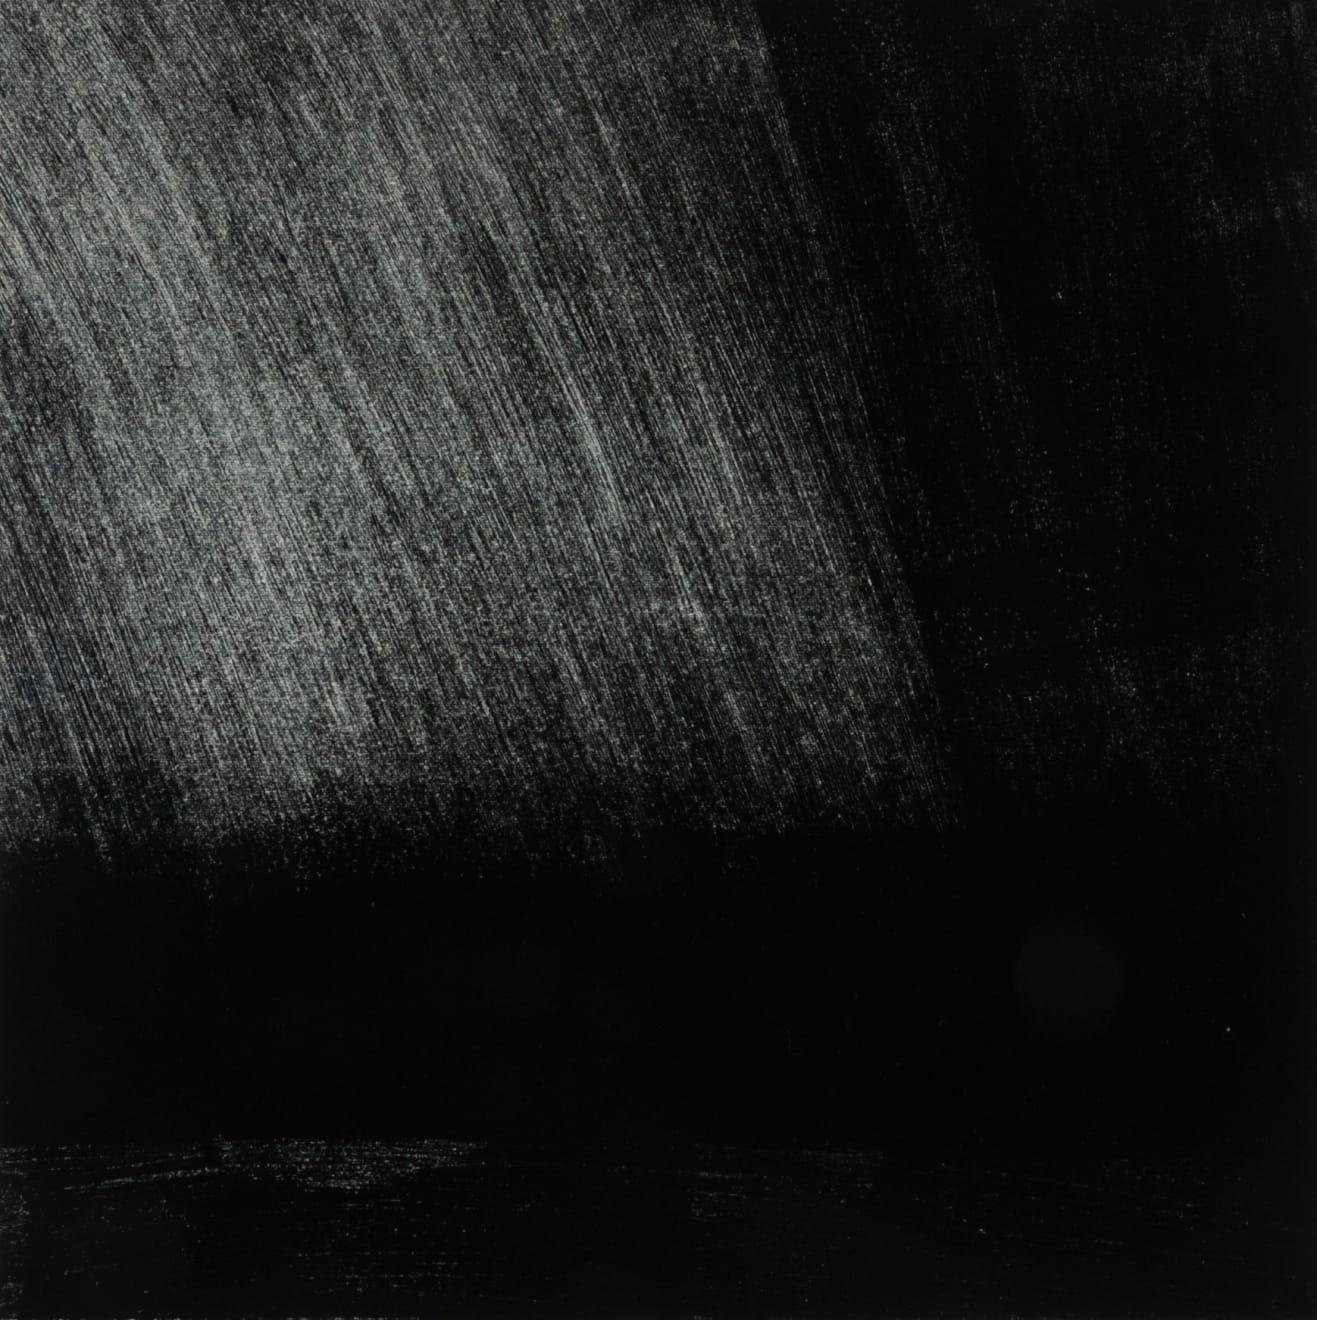 Nigel Swift, Deluge at Night, 2019